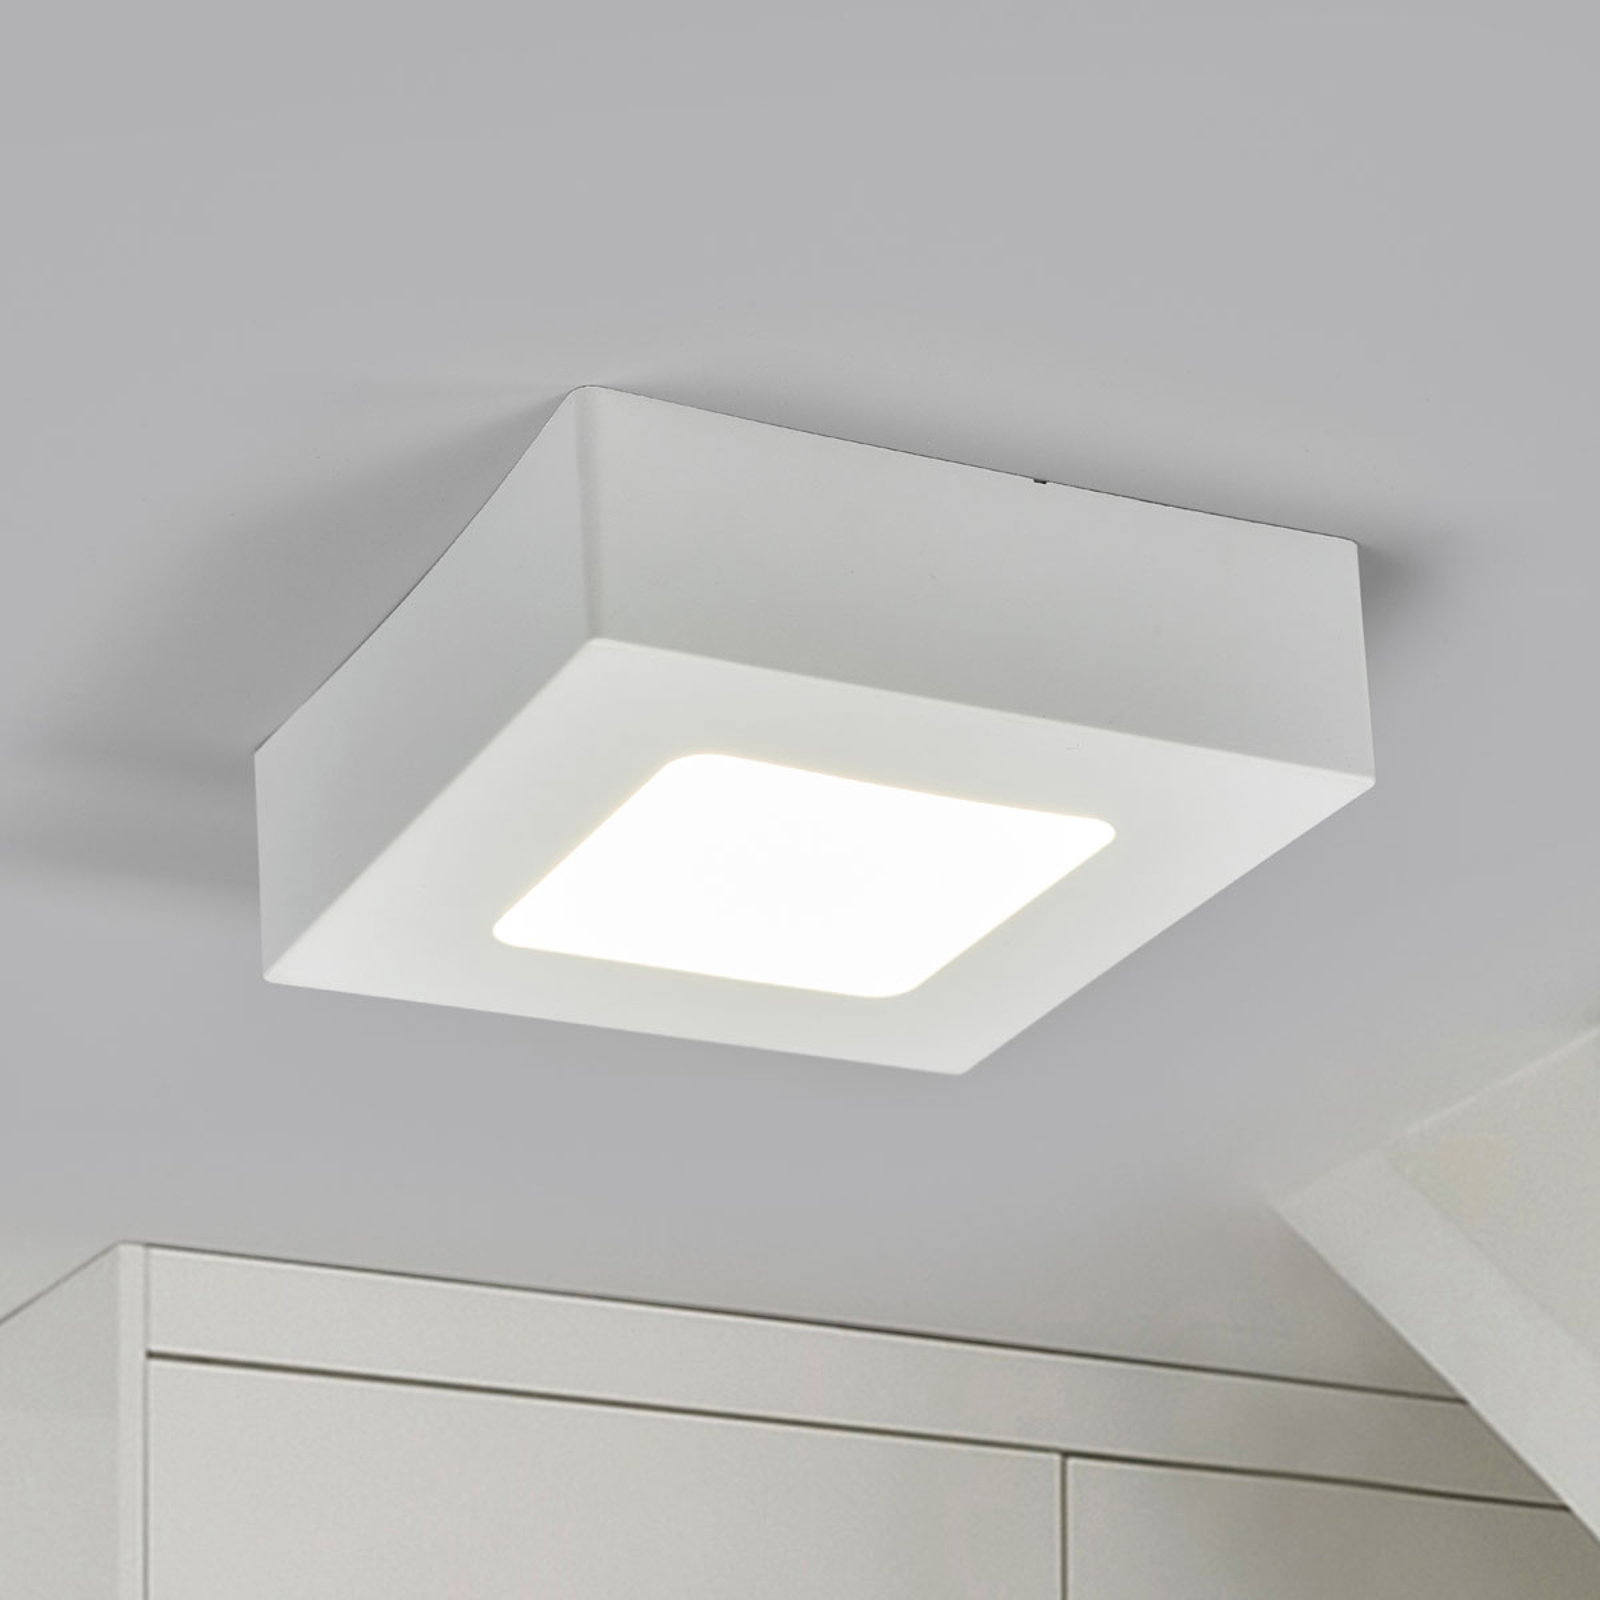 LED-Deckenlampe Marlo weiß 4000K eckig 12,8cm